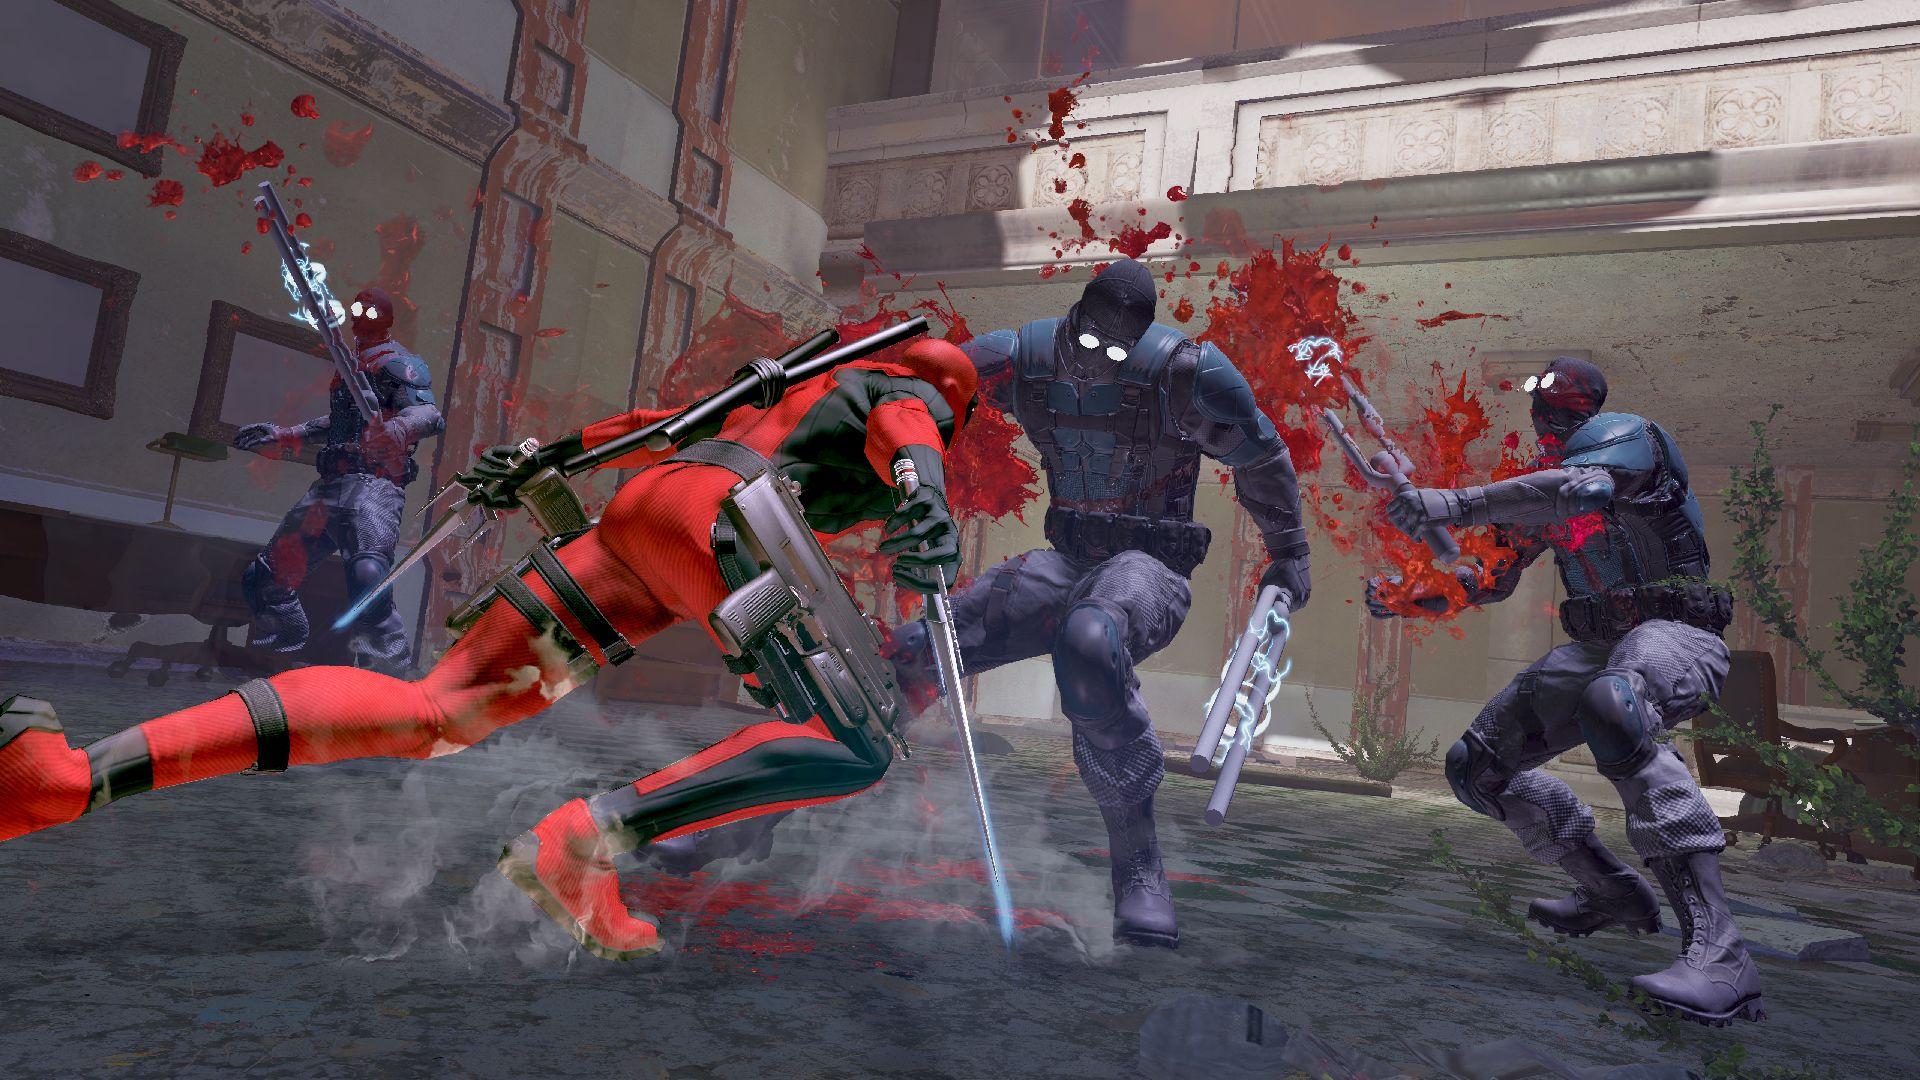 "http://gamingbolt.com/wp-content/uploads/2013/02/Deadpool-10.jpg গেমস ওয়ার্ল্ড [পর্ব-২৮] :: ""গেমস ওয়ার্ল্ড"" গেমস অ্যাওয়ার্ড ২০১৩ ( ২০১৩ সালের টপ ২৫ টি গেমস )"